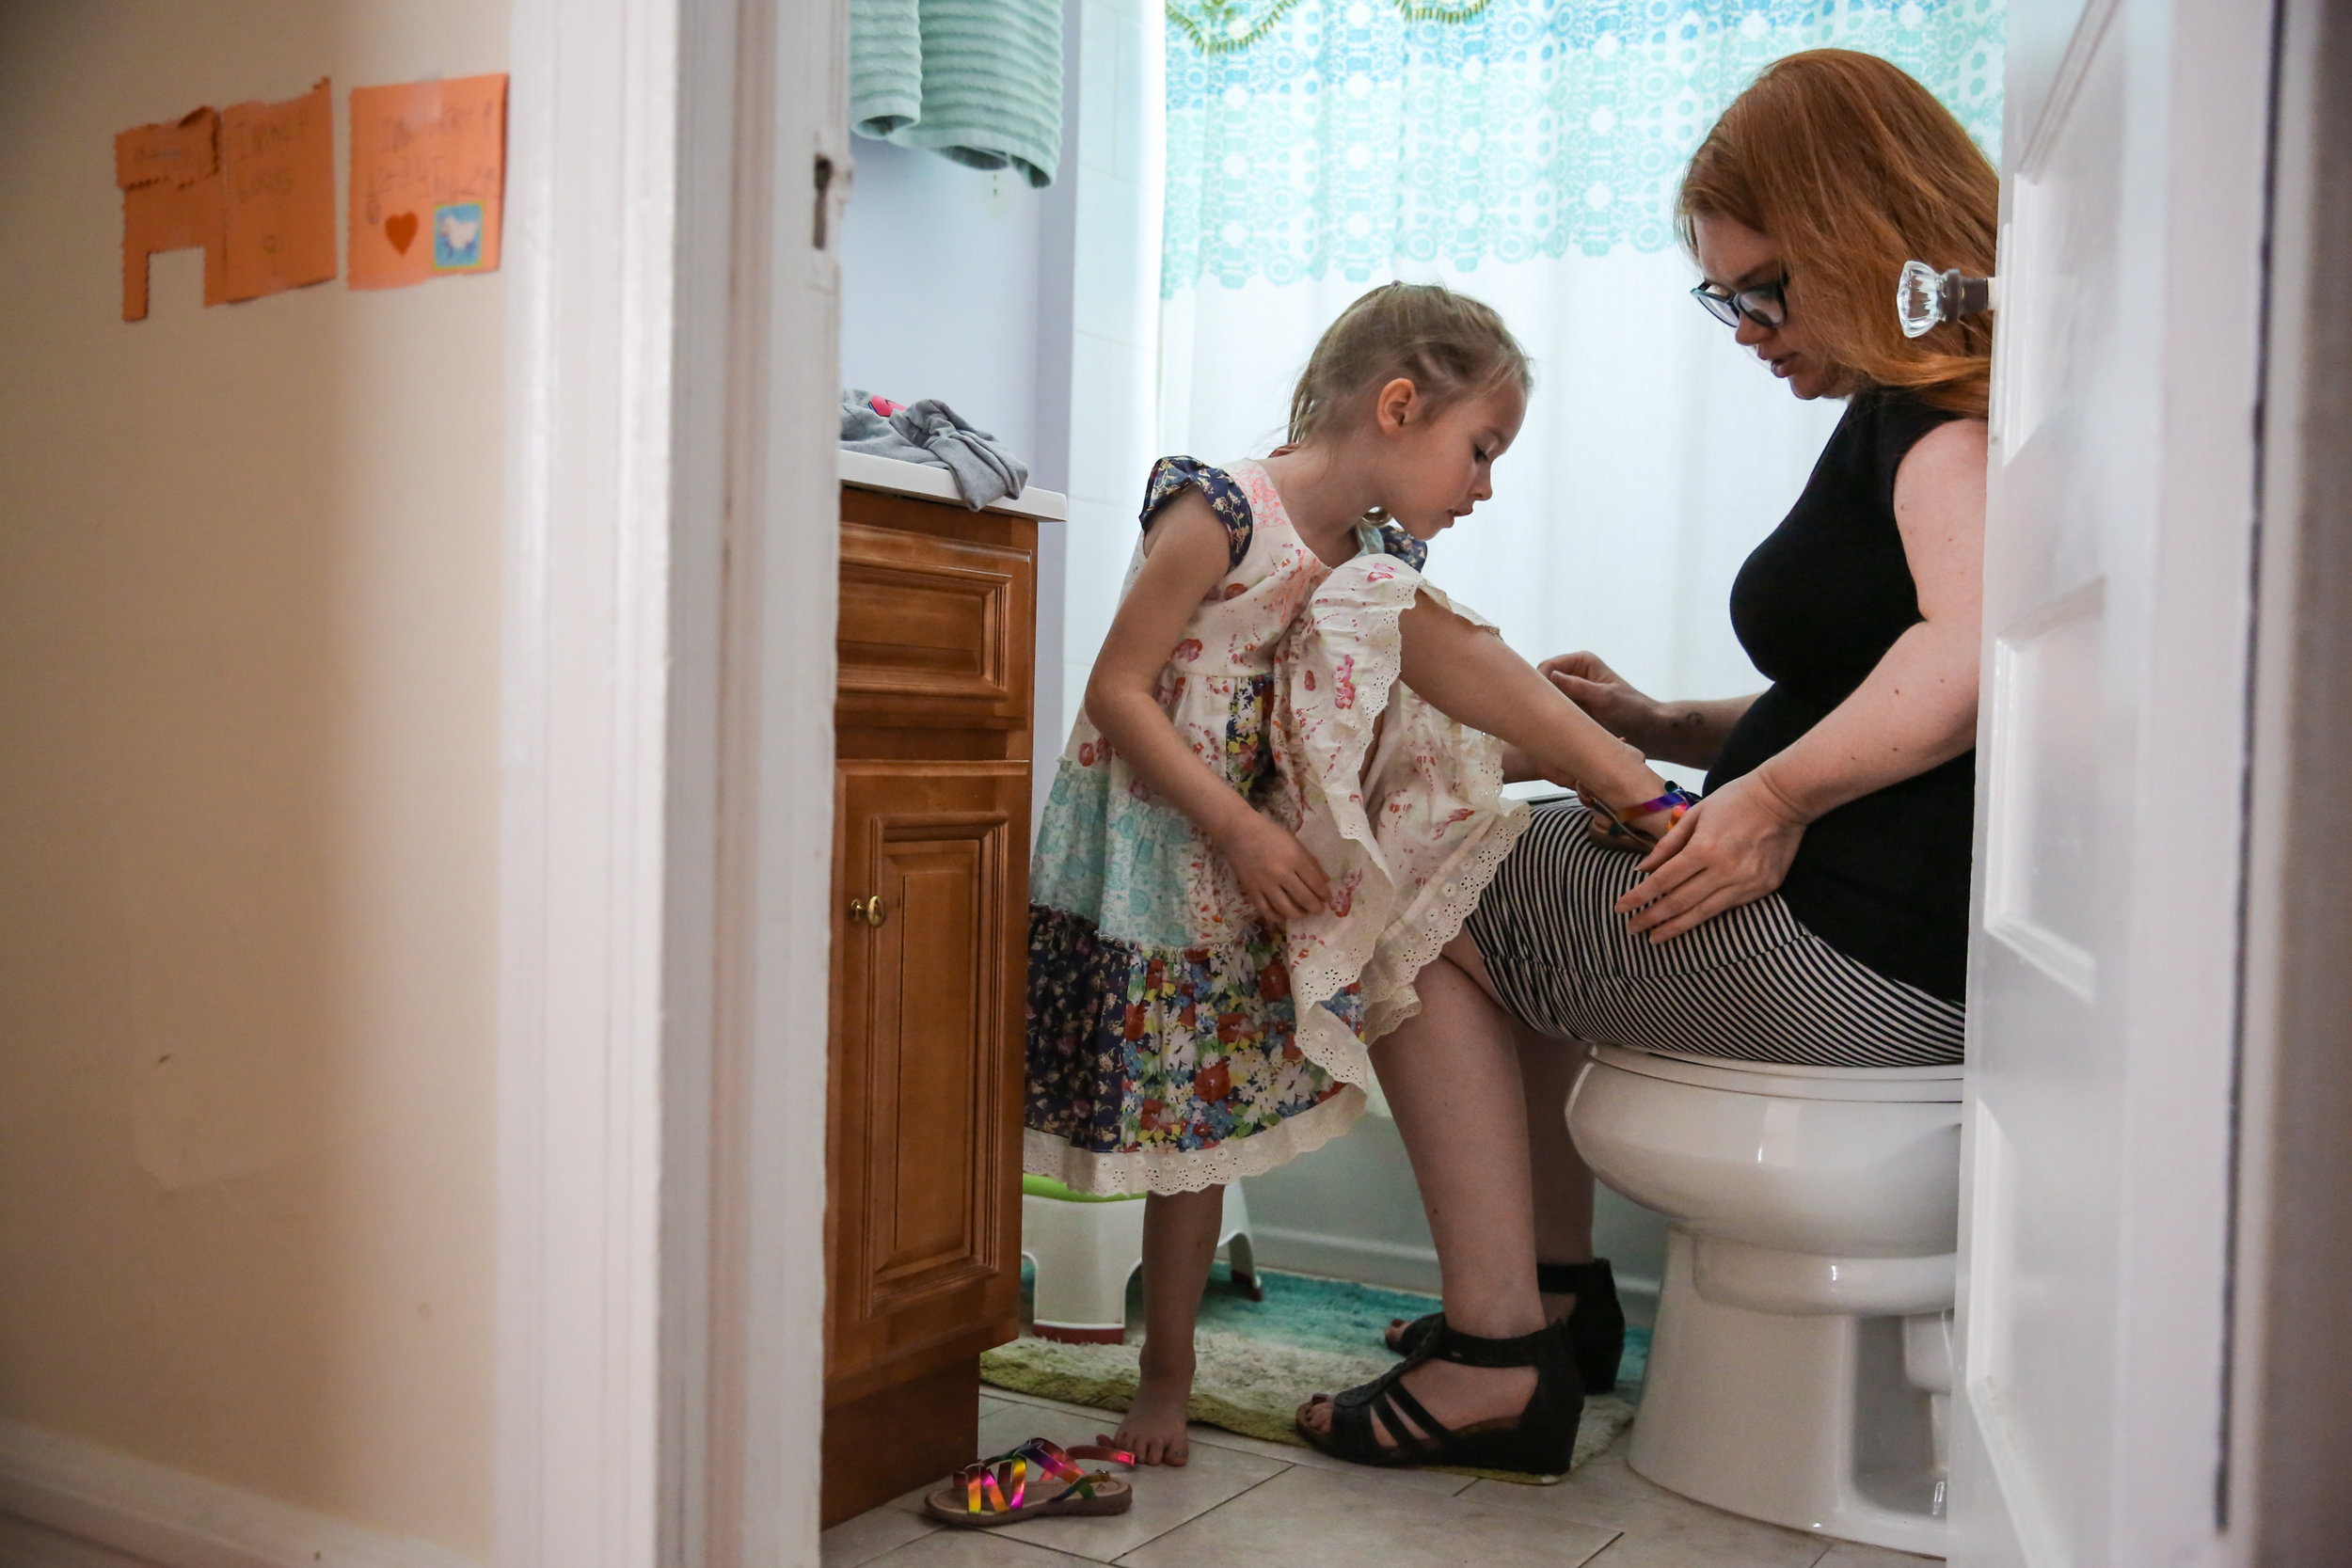 Woman checks girl's leg while sitting in bathroom